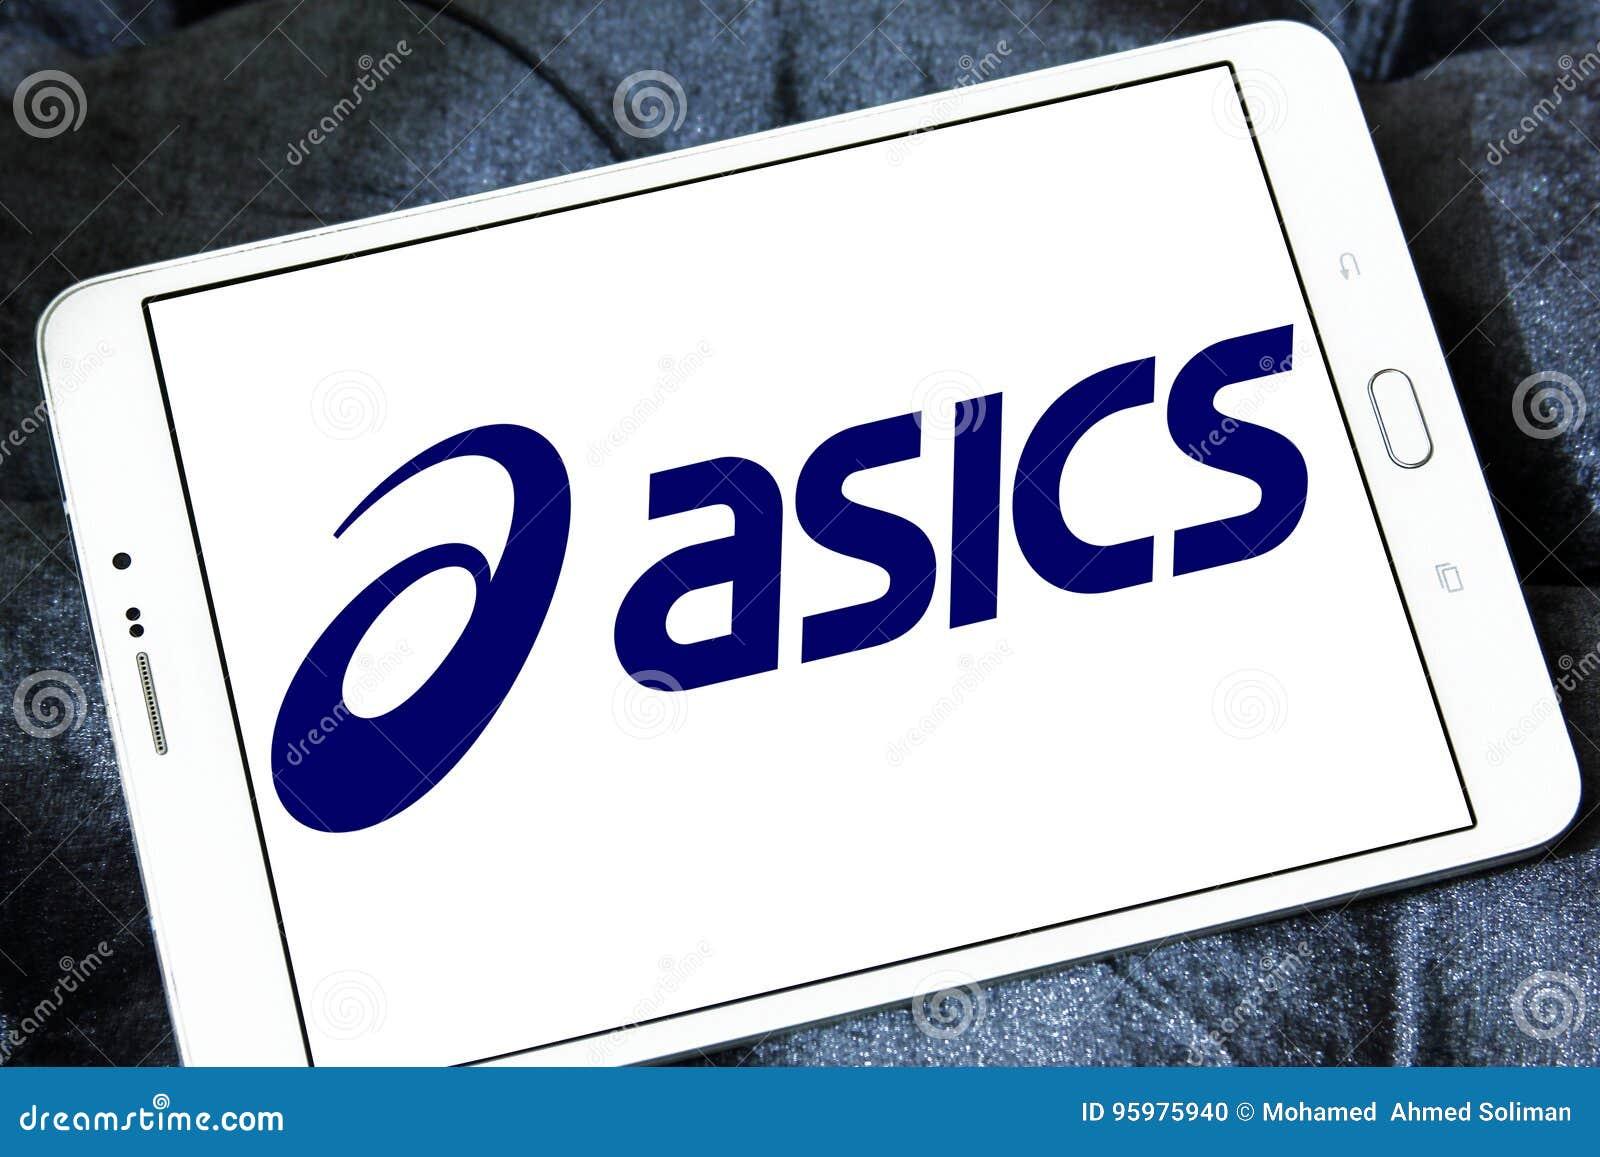 db9a0debcf48 Asics logo editorial image. Image of nike